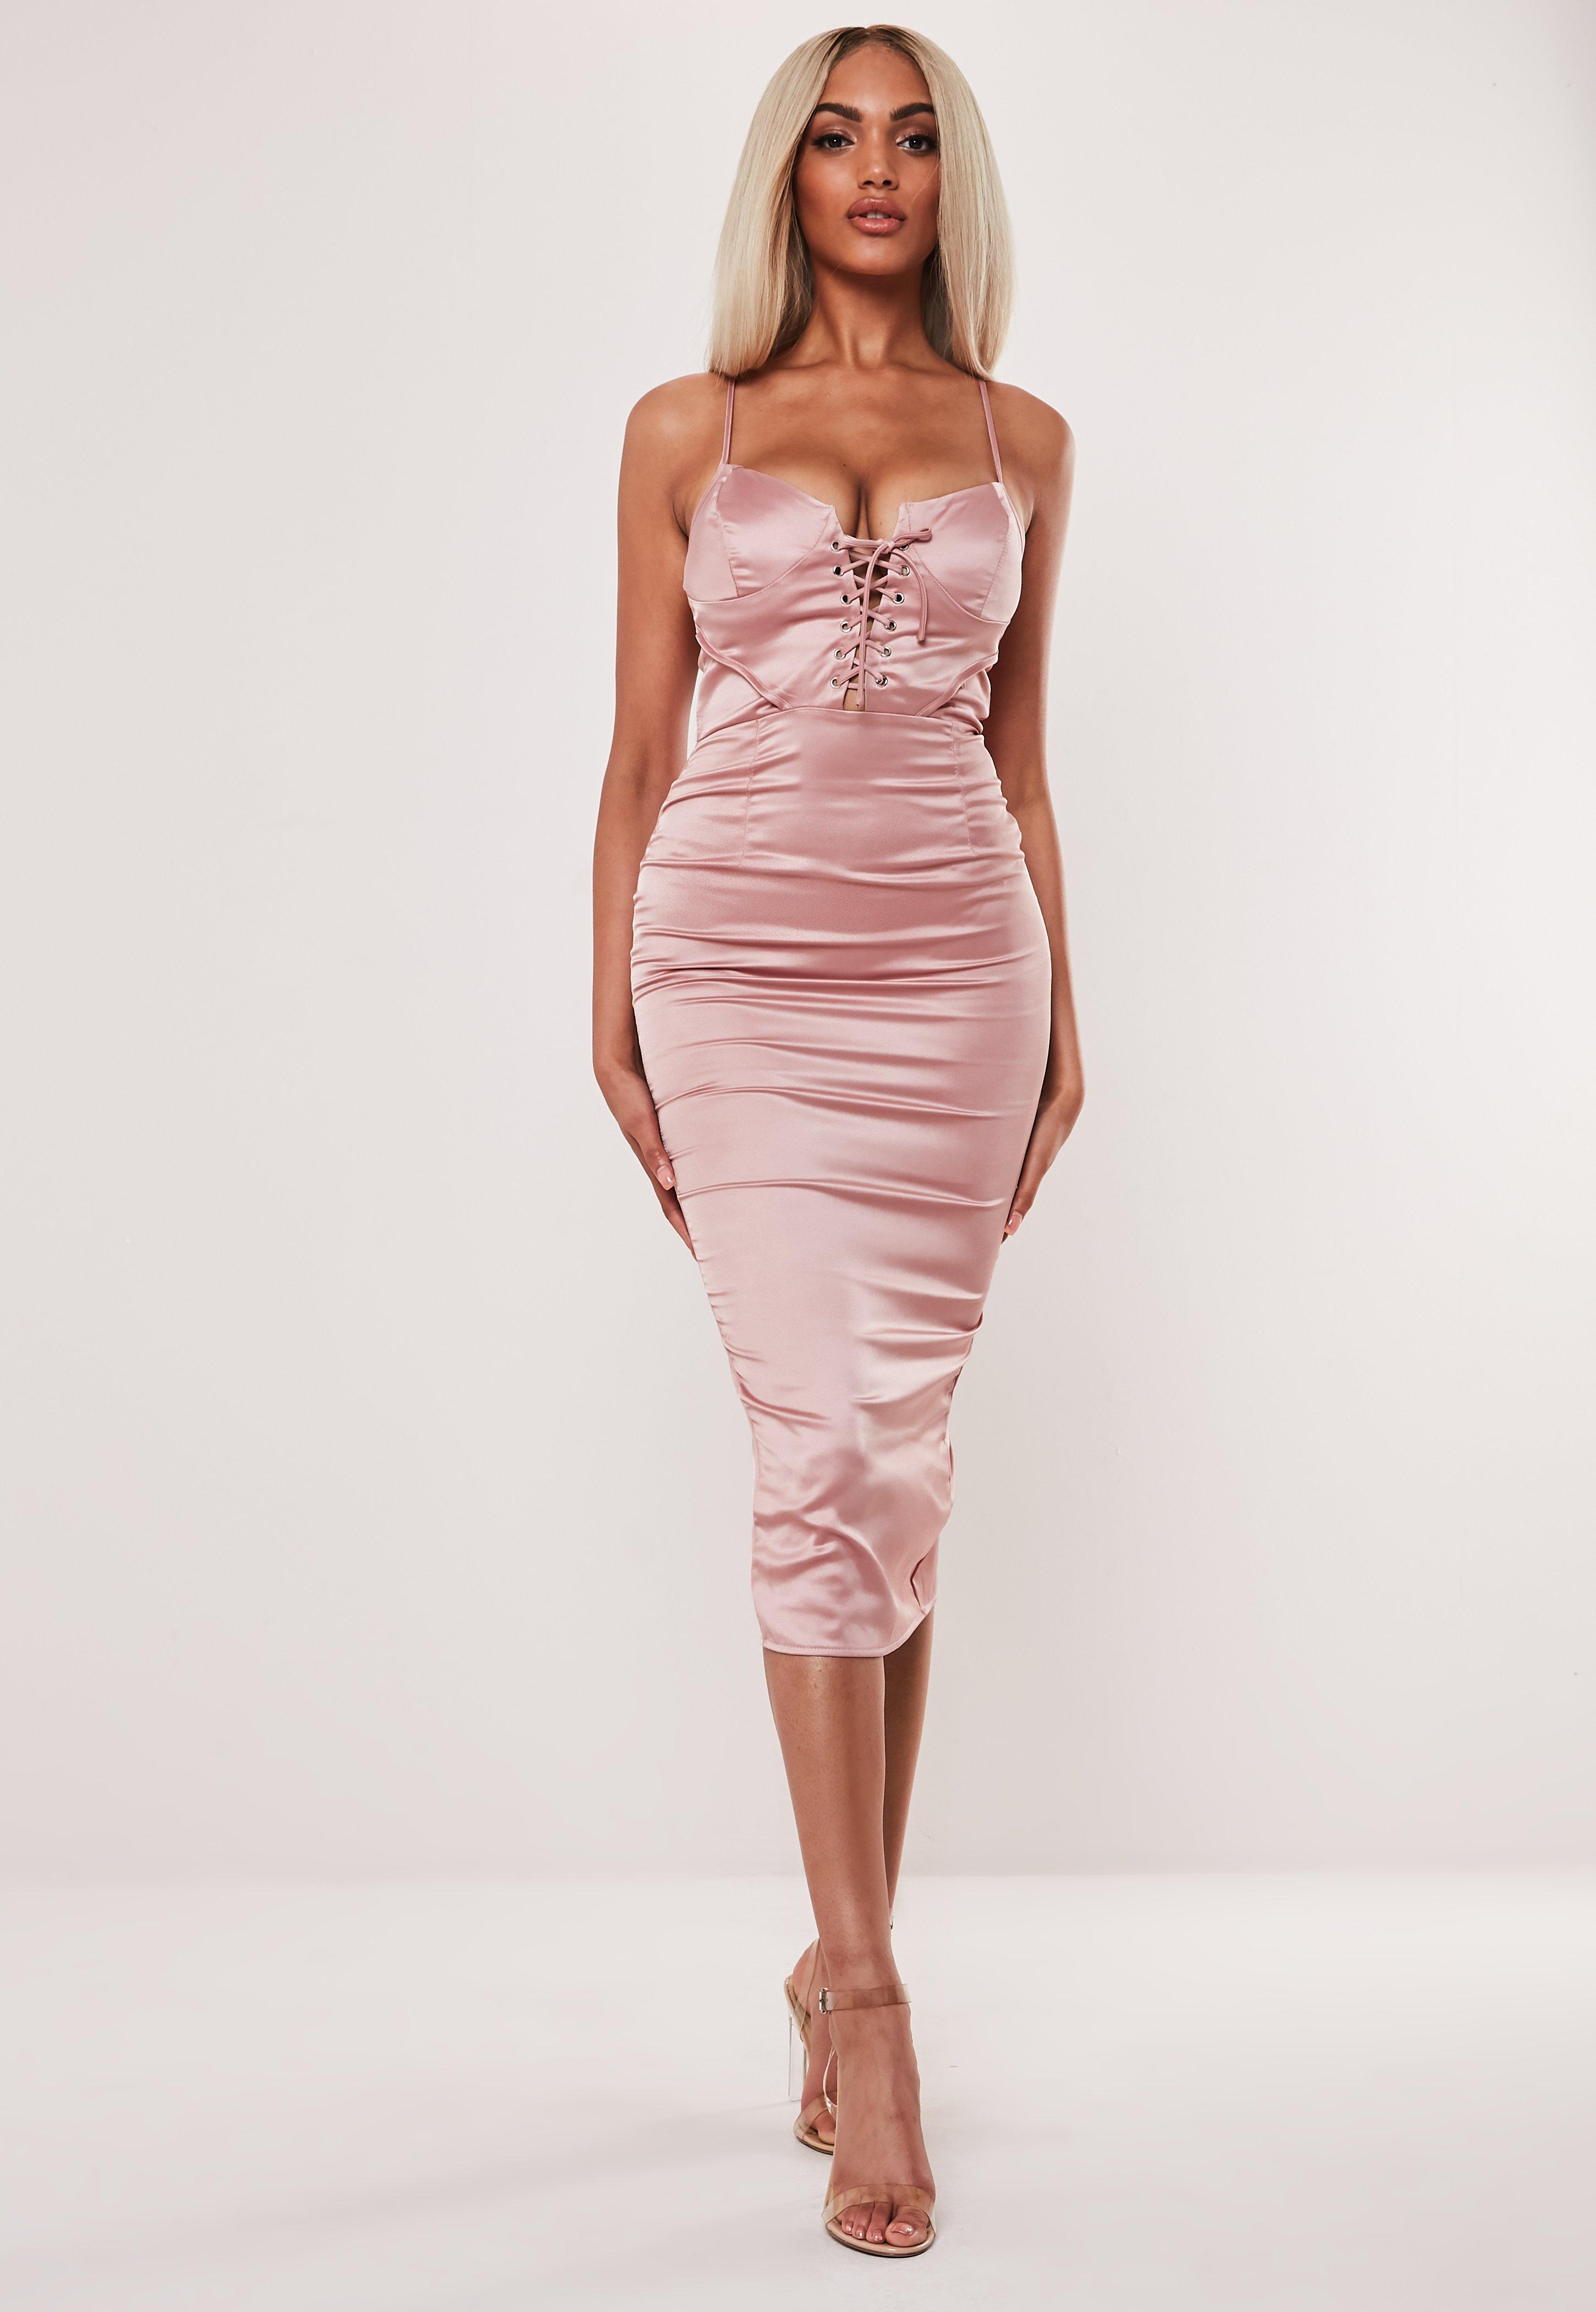 b5234fec132 Rose Satin Lace Up Bust Cup Midaxi Dress